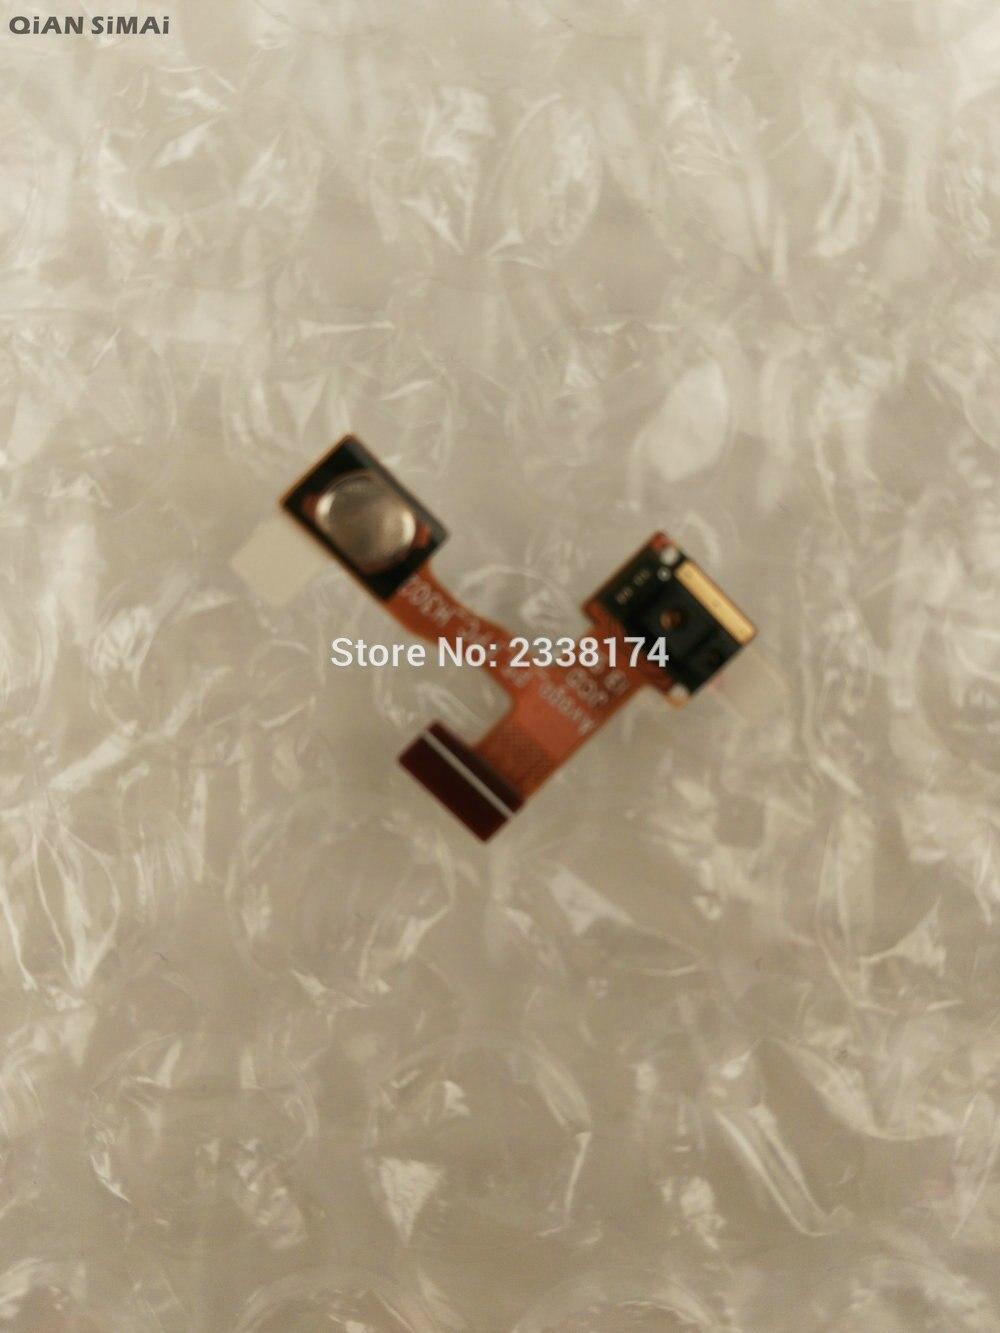 QiAN SiMAi para Lenovo A850 nuevo botón de encendido/apagado Original Cable flexible piezas de reparación + envío gratis